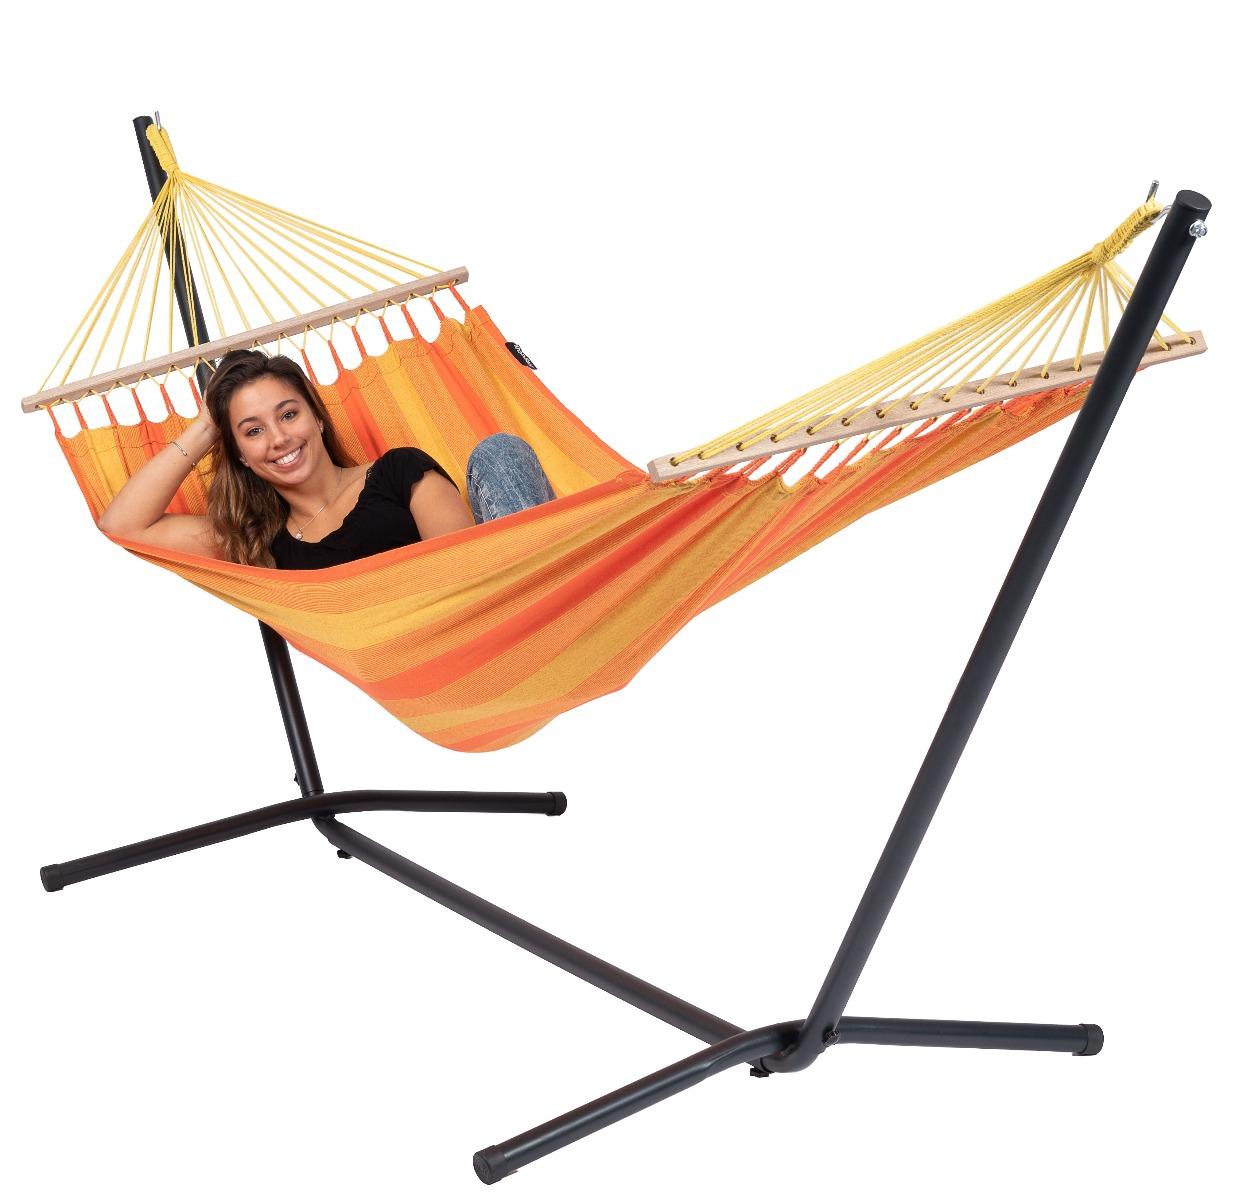 'Easy & Relax' Orange E�npersoons Hangmatset - Oranje - Tropilex �